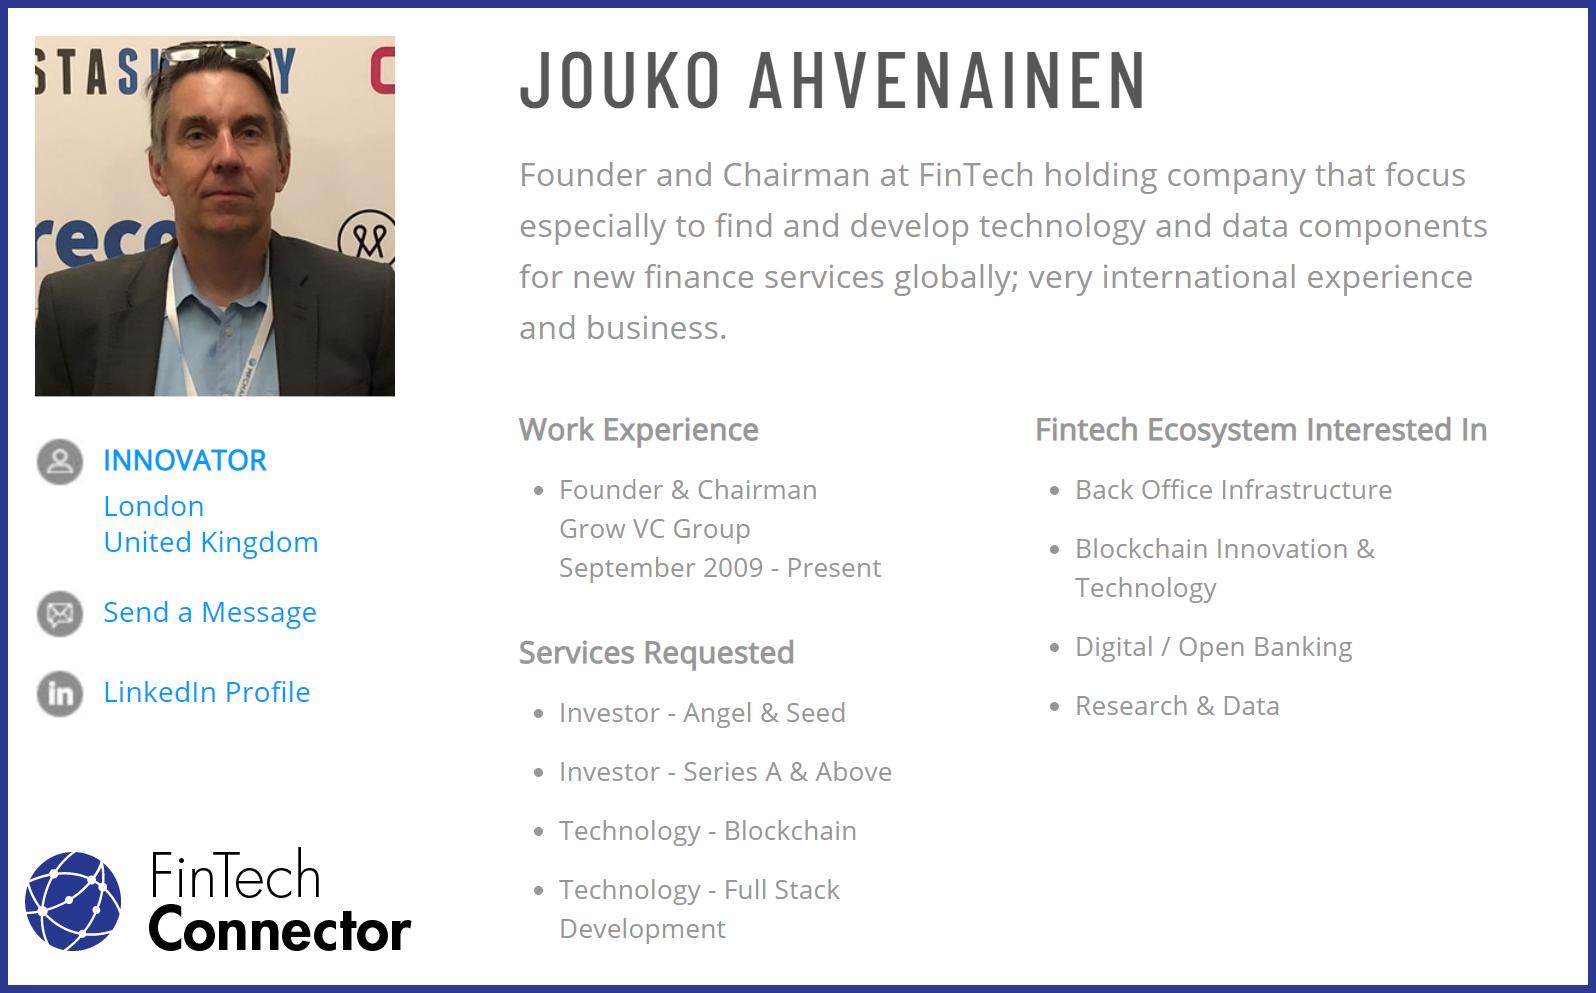 Connect with Jouko Ahvenainen via FinTech Connector -  https://members.fintechconnector.com/user/sign_up